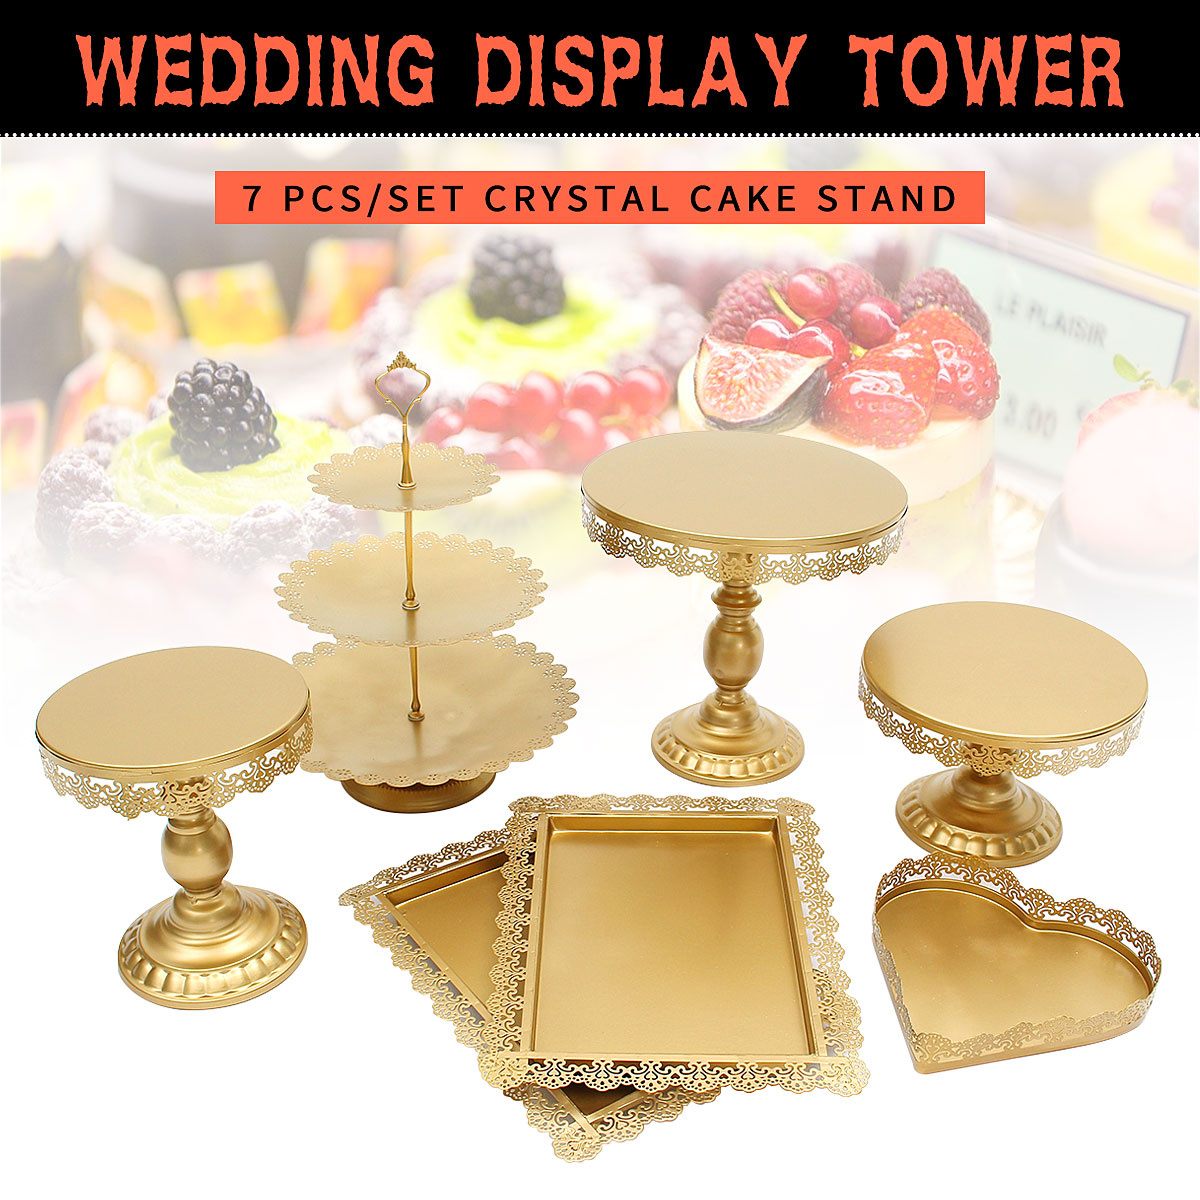 14Pcs Set Crystal Metal Cake Holder Cupcake Stand Wedding Birthday Party Display